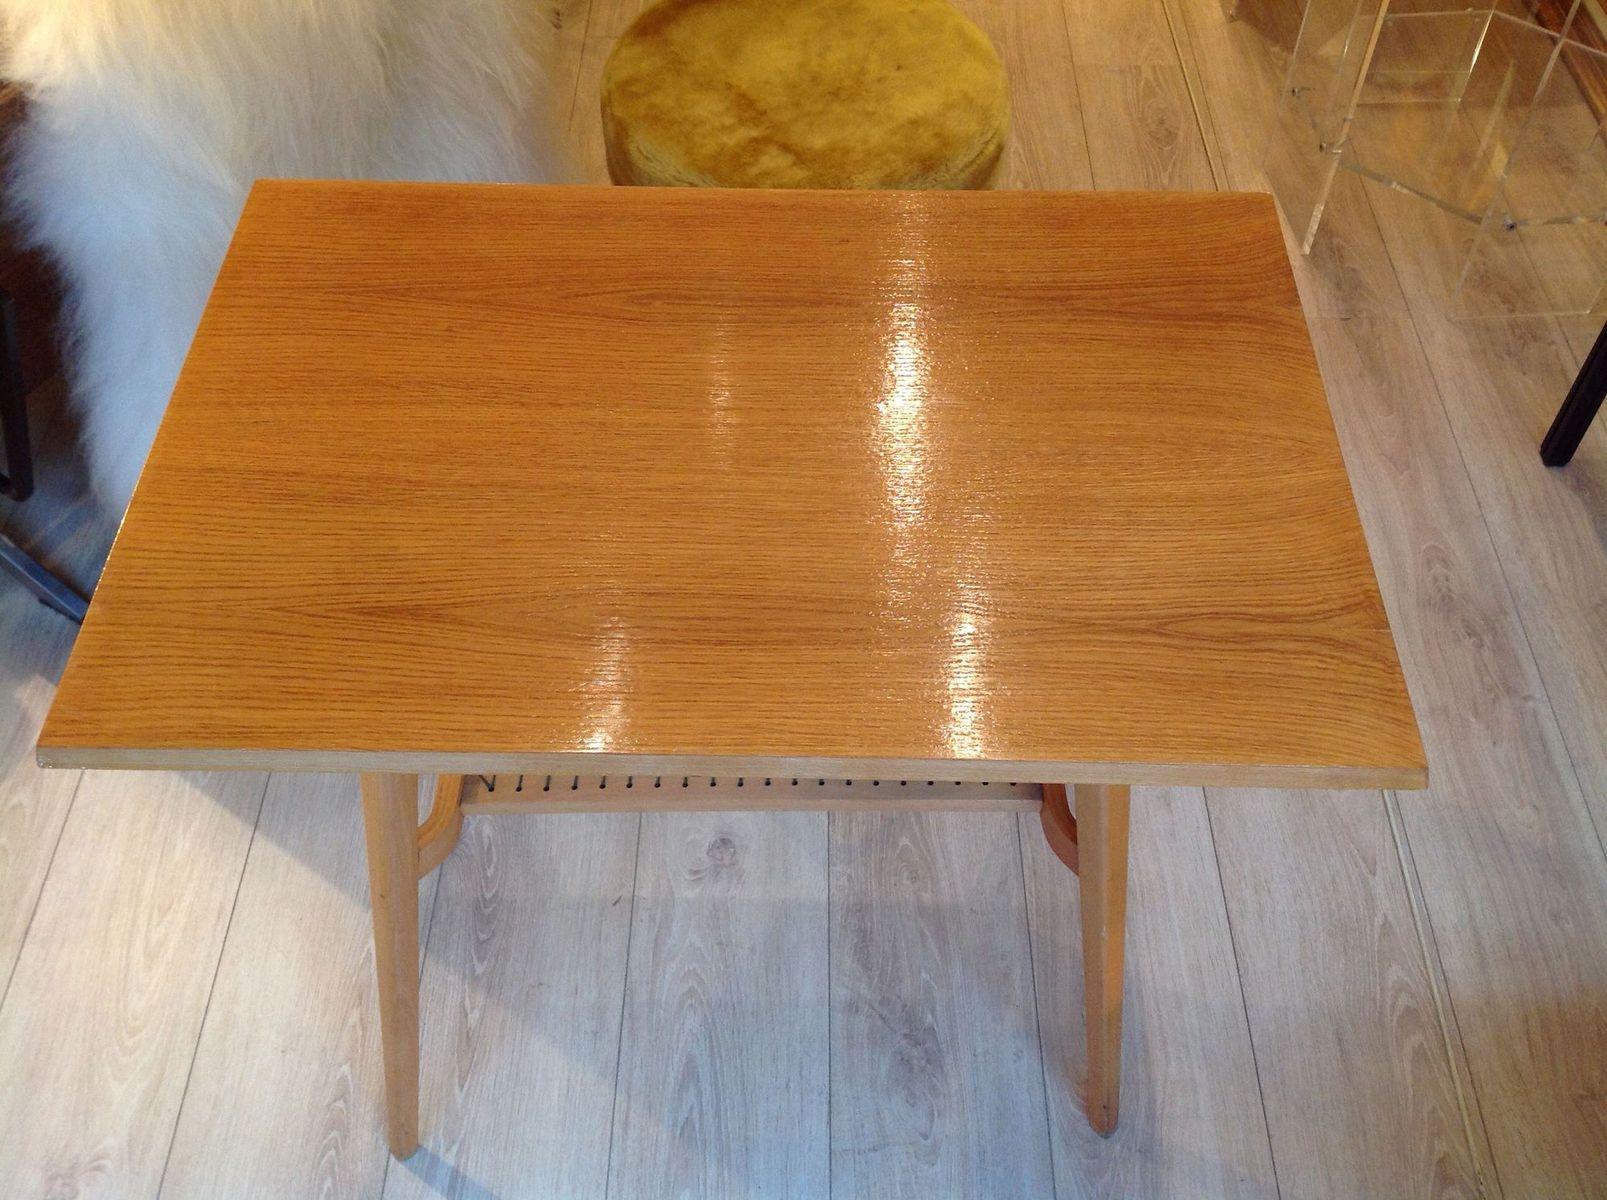 table d 39 appoint en ch ne clair de drevopodnik holesov 1960 en vente sur pamono. Black Bedroom Furniture Sets. Home Design Ideas